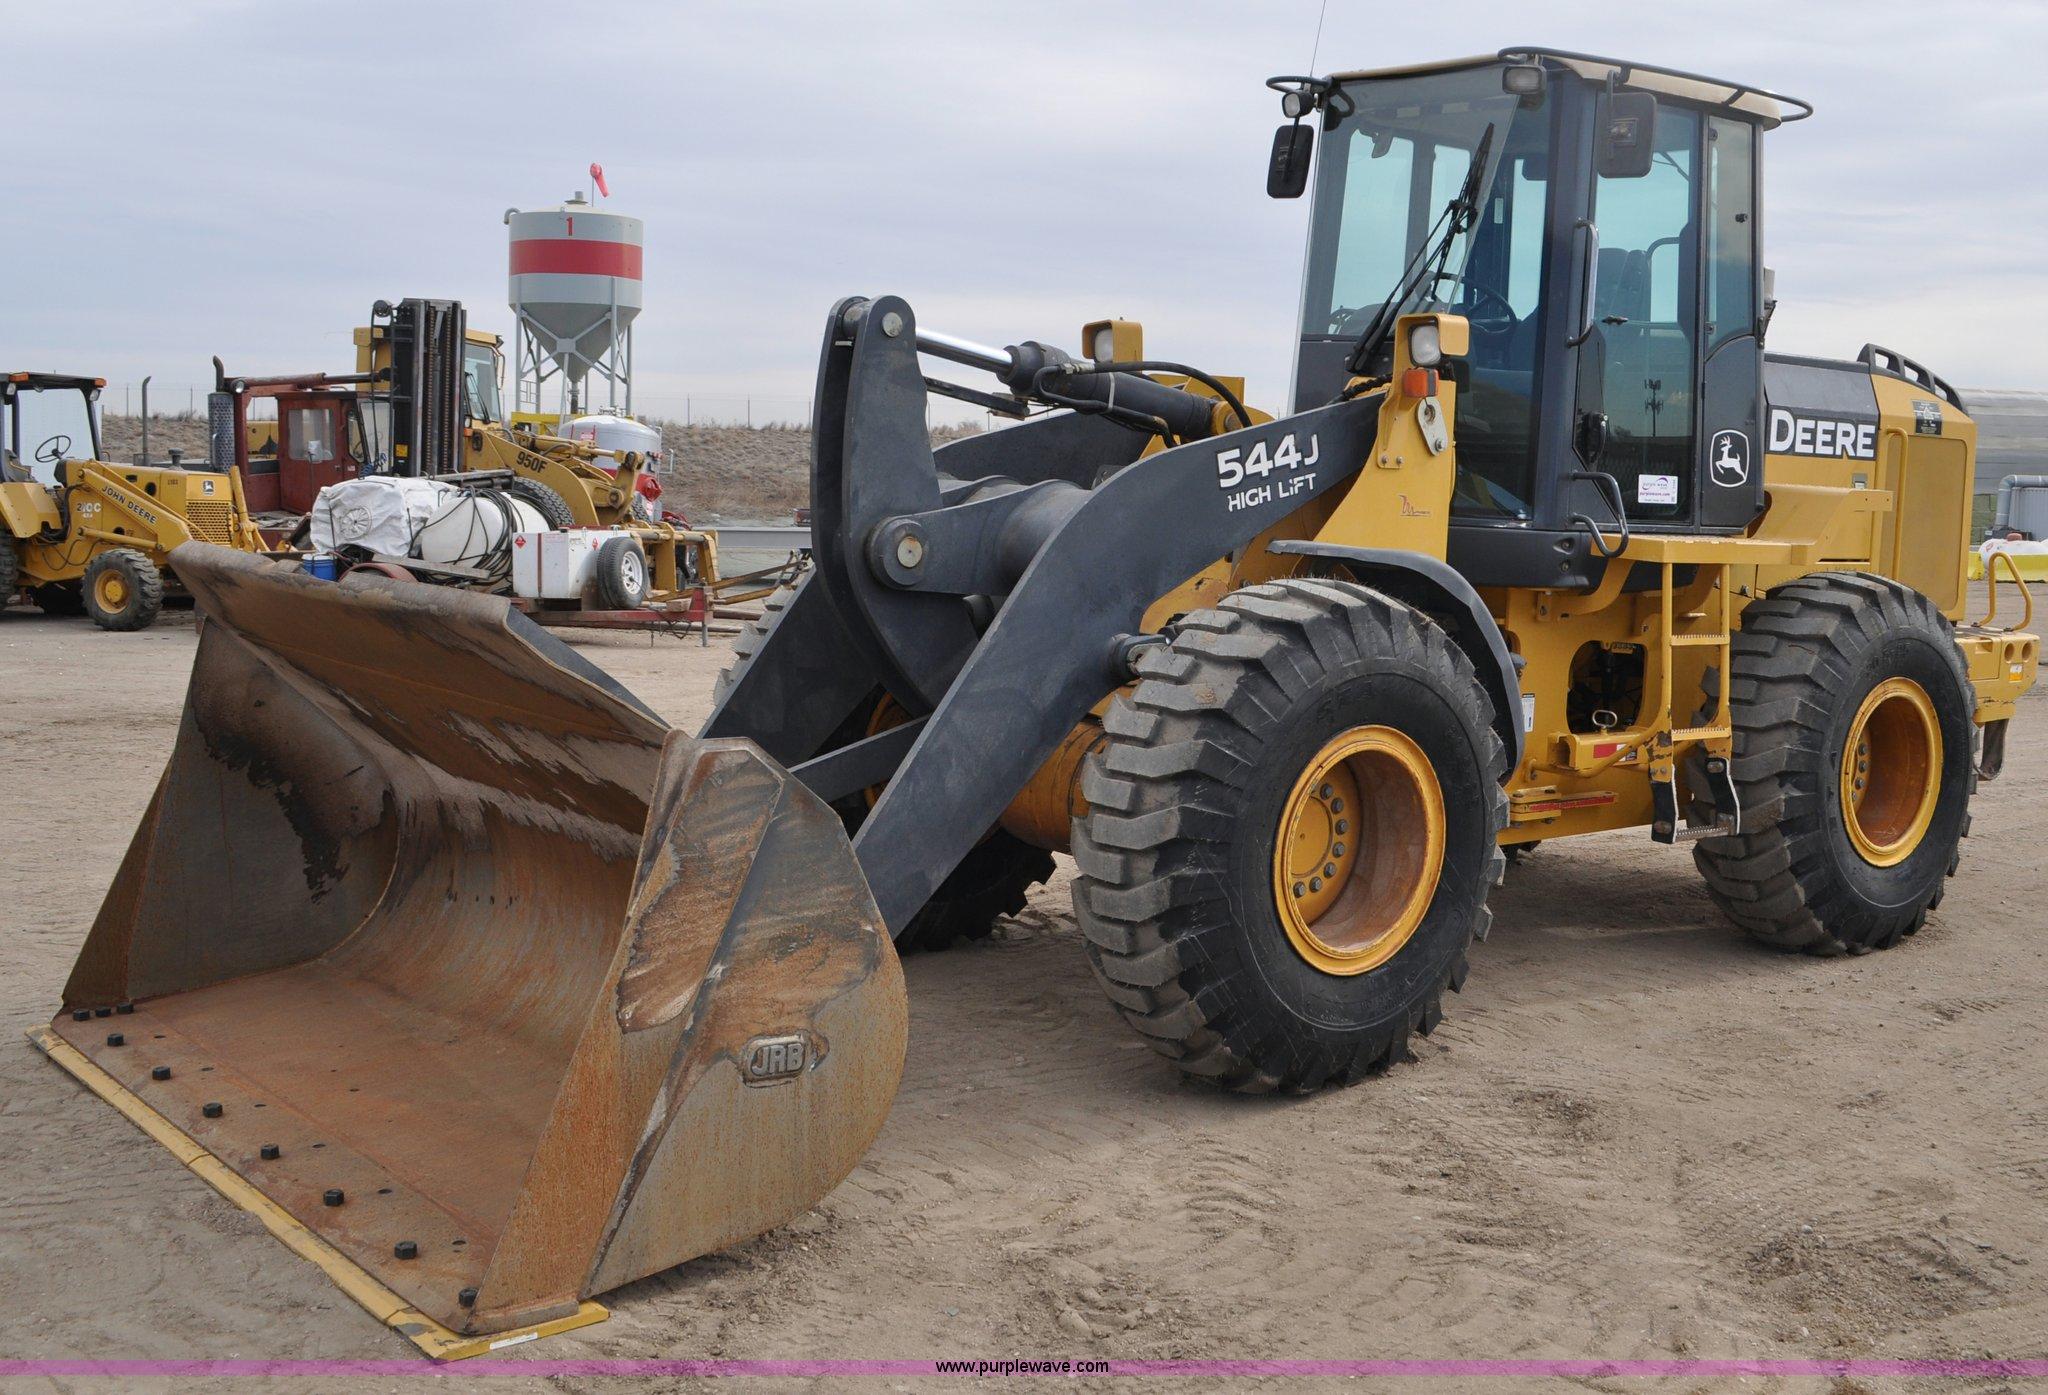 C3386 image for item C3386 2005 John Deere 544J wheel loader